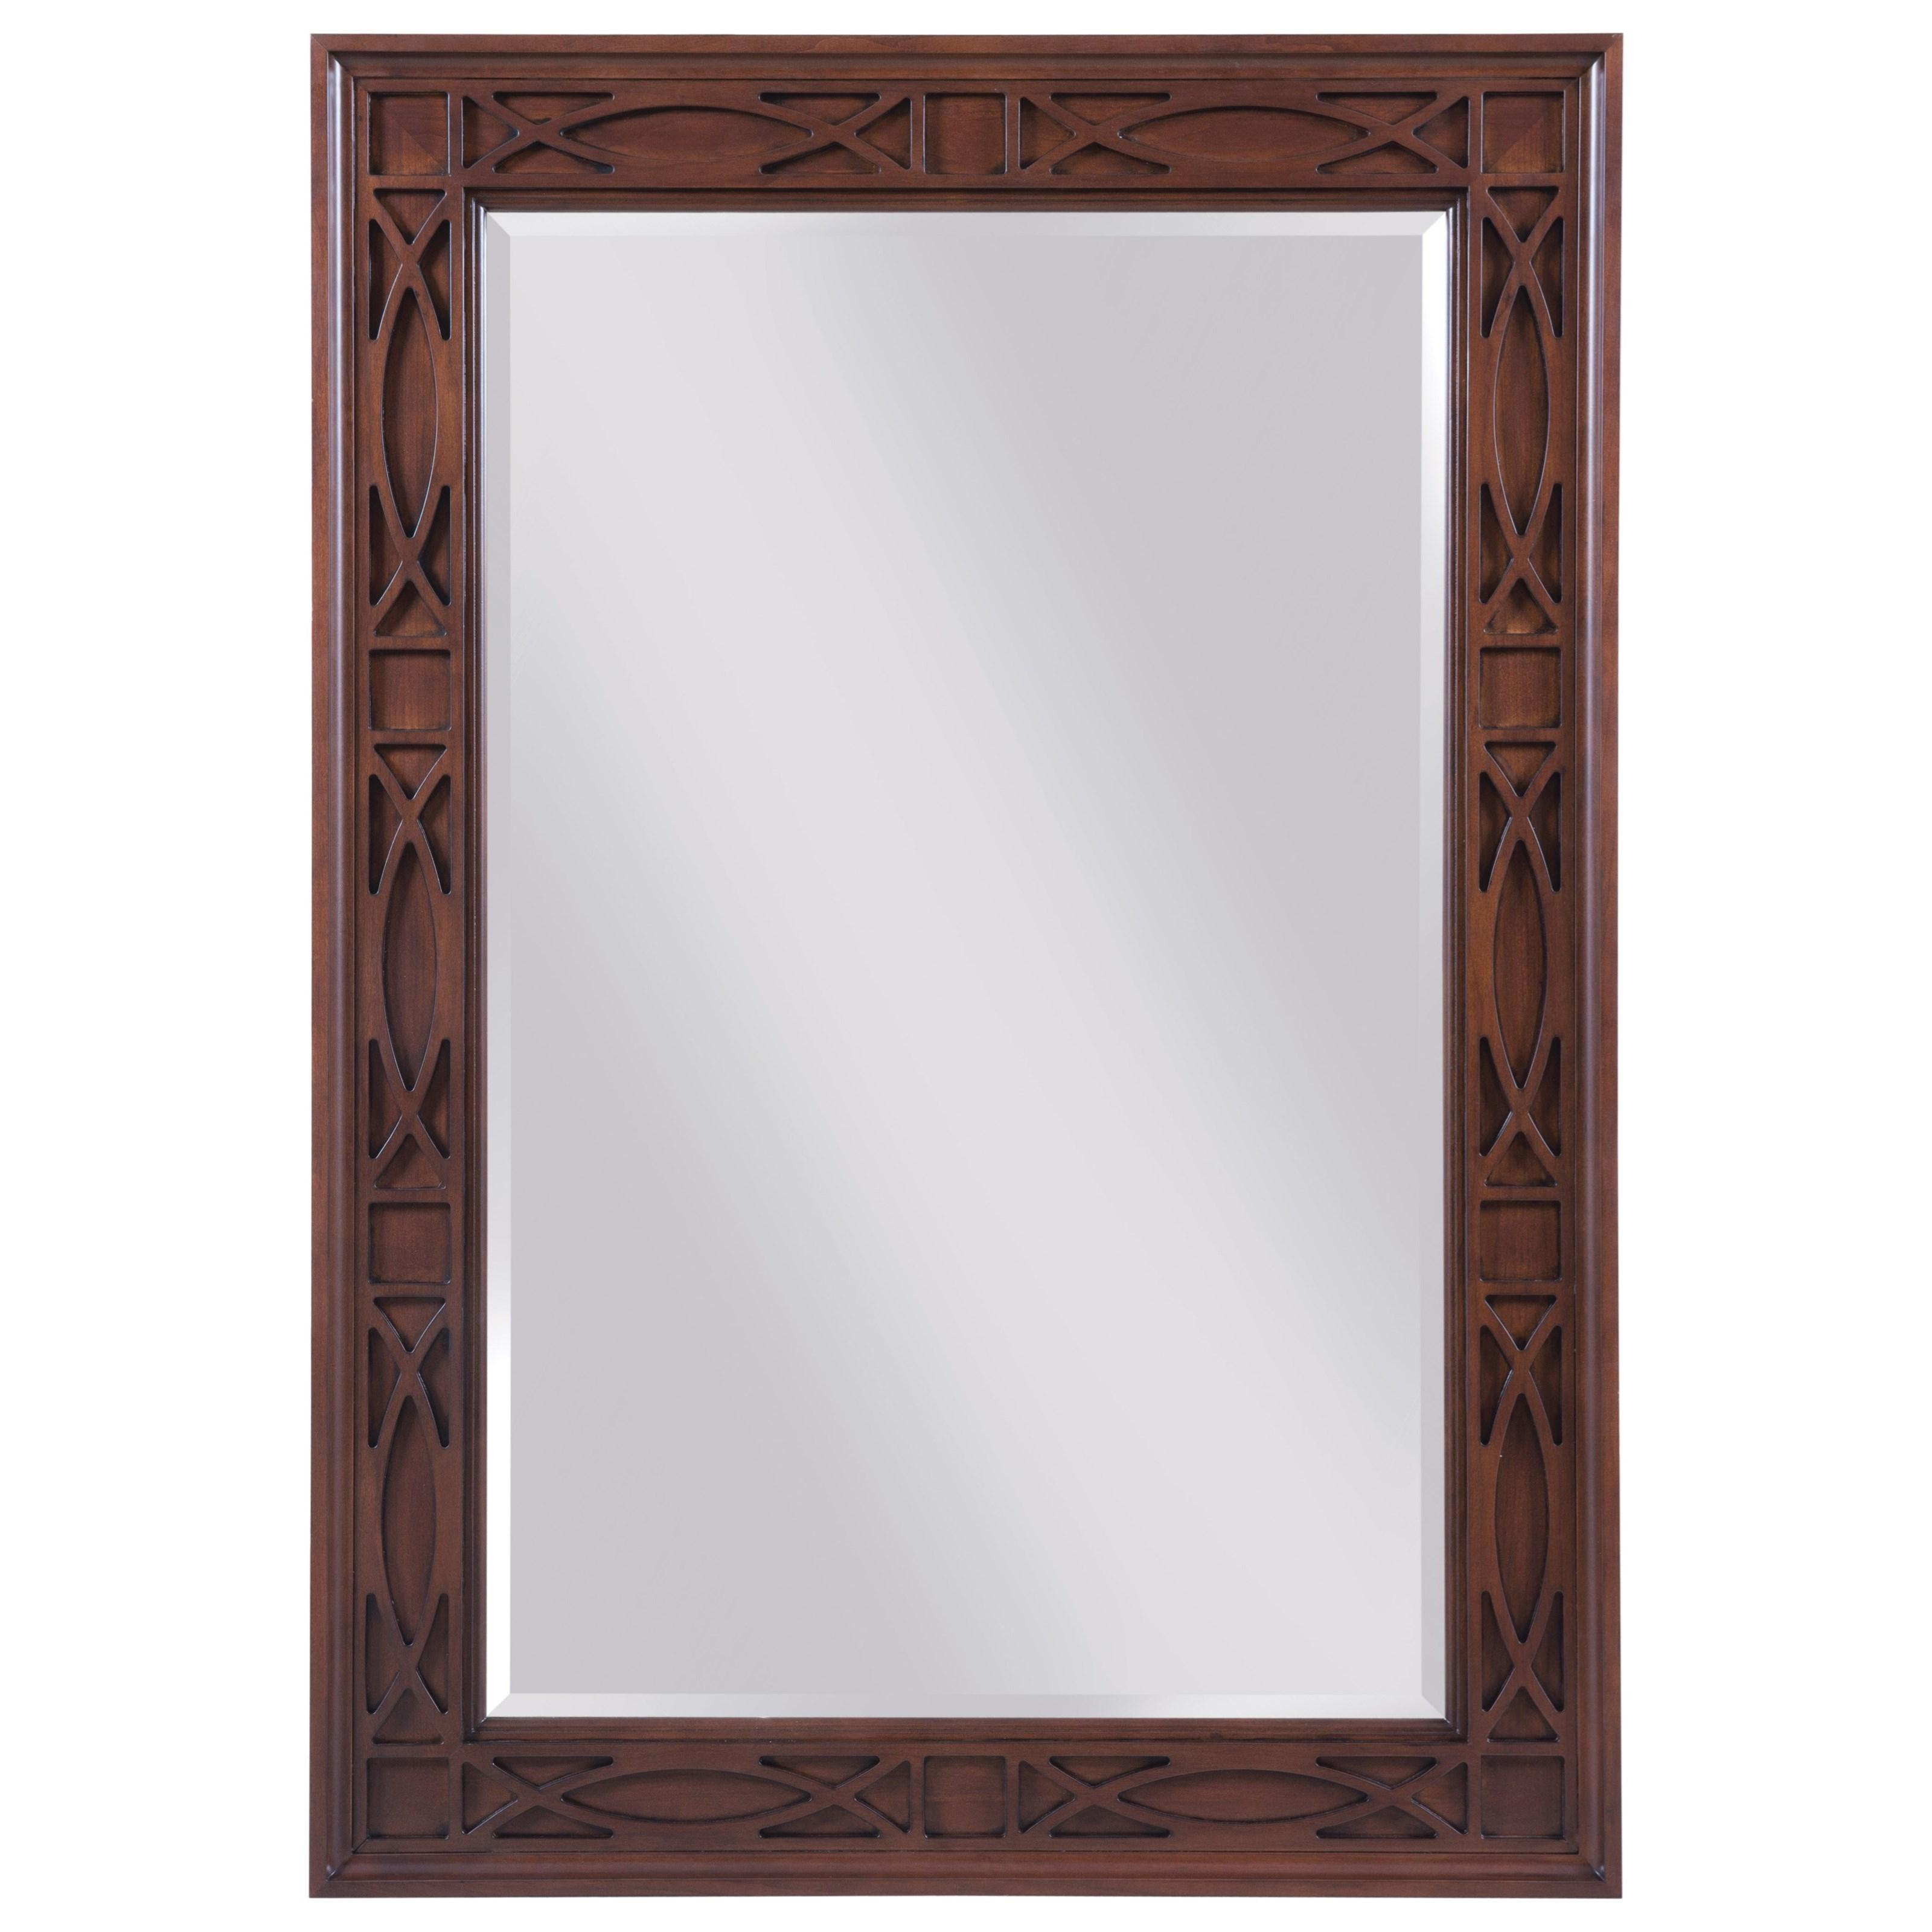 Hadleigh Decorative Mirror by Kincaid Furniture at Johnny Janosik